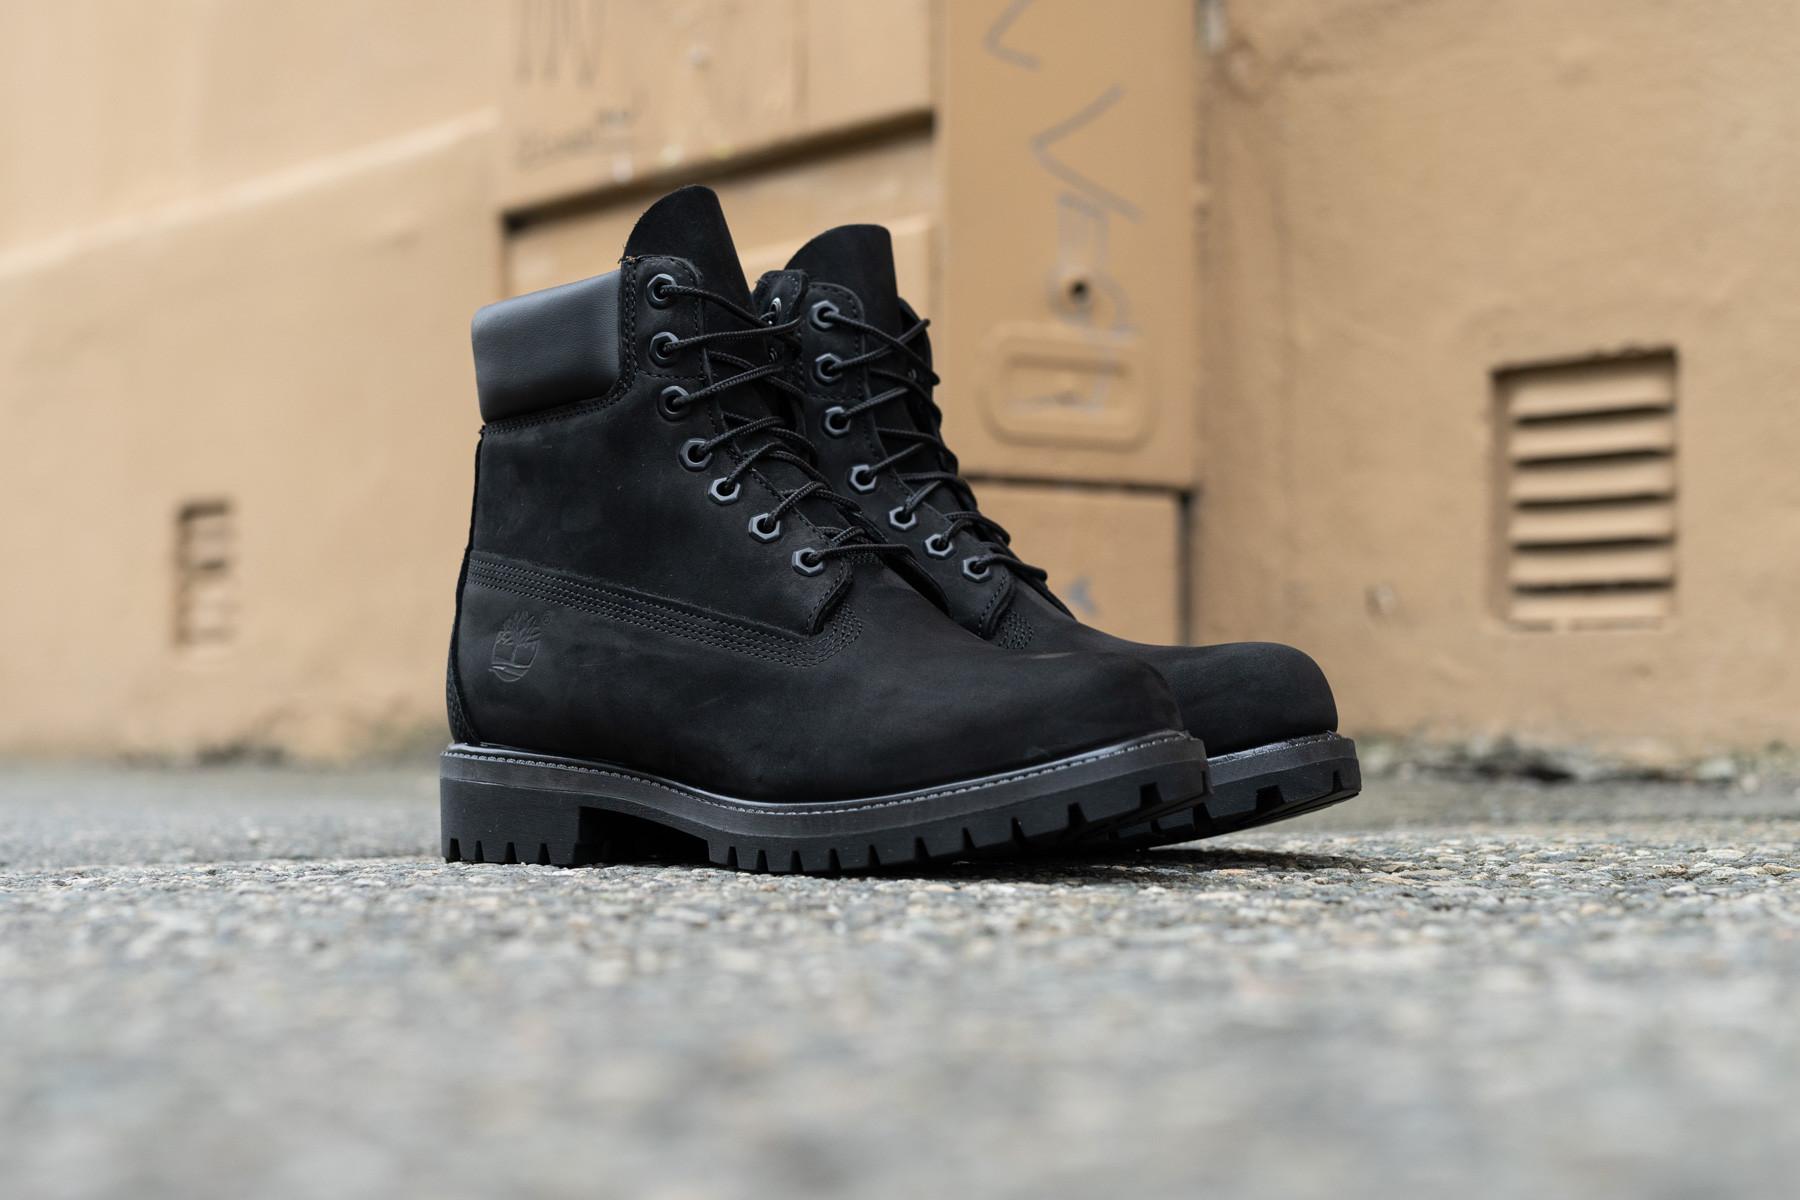 Timberland 6 Inch Premium Herre Boots Sneaker.no